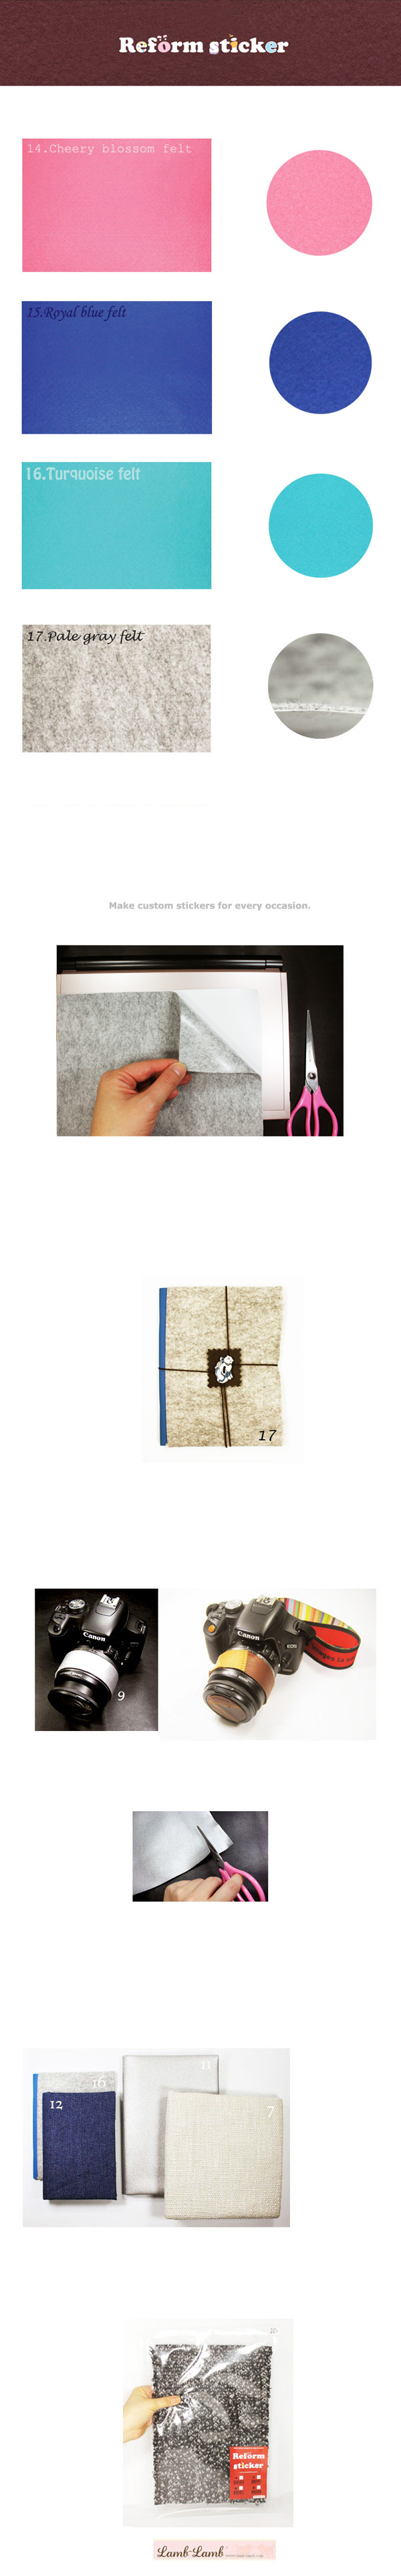 Reform sticker -C - 램램, 6,500원, 스티커, 리폼/DIY스티커